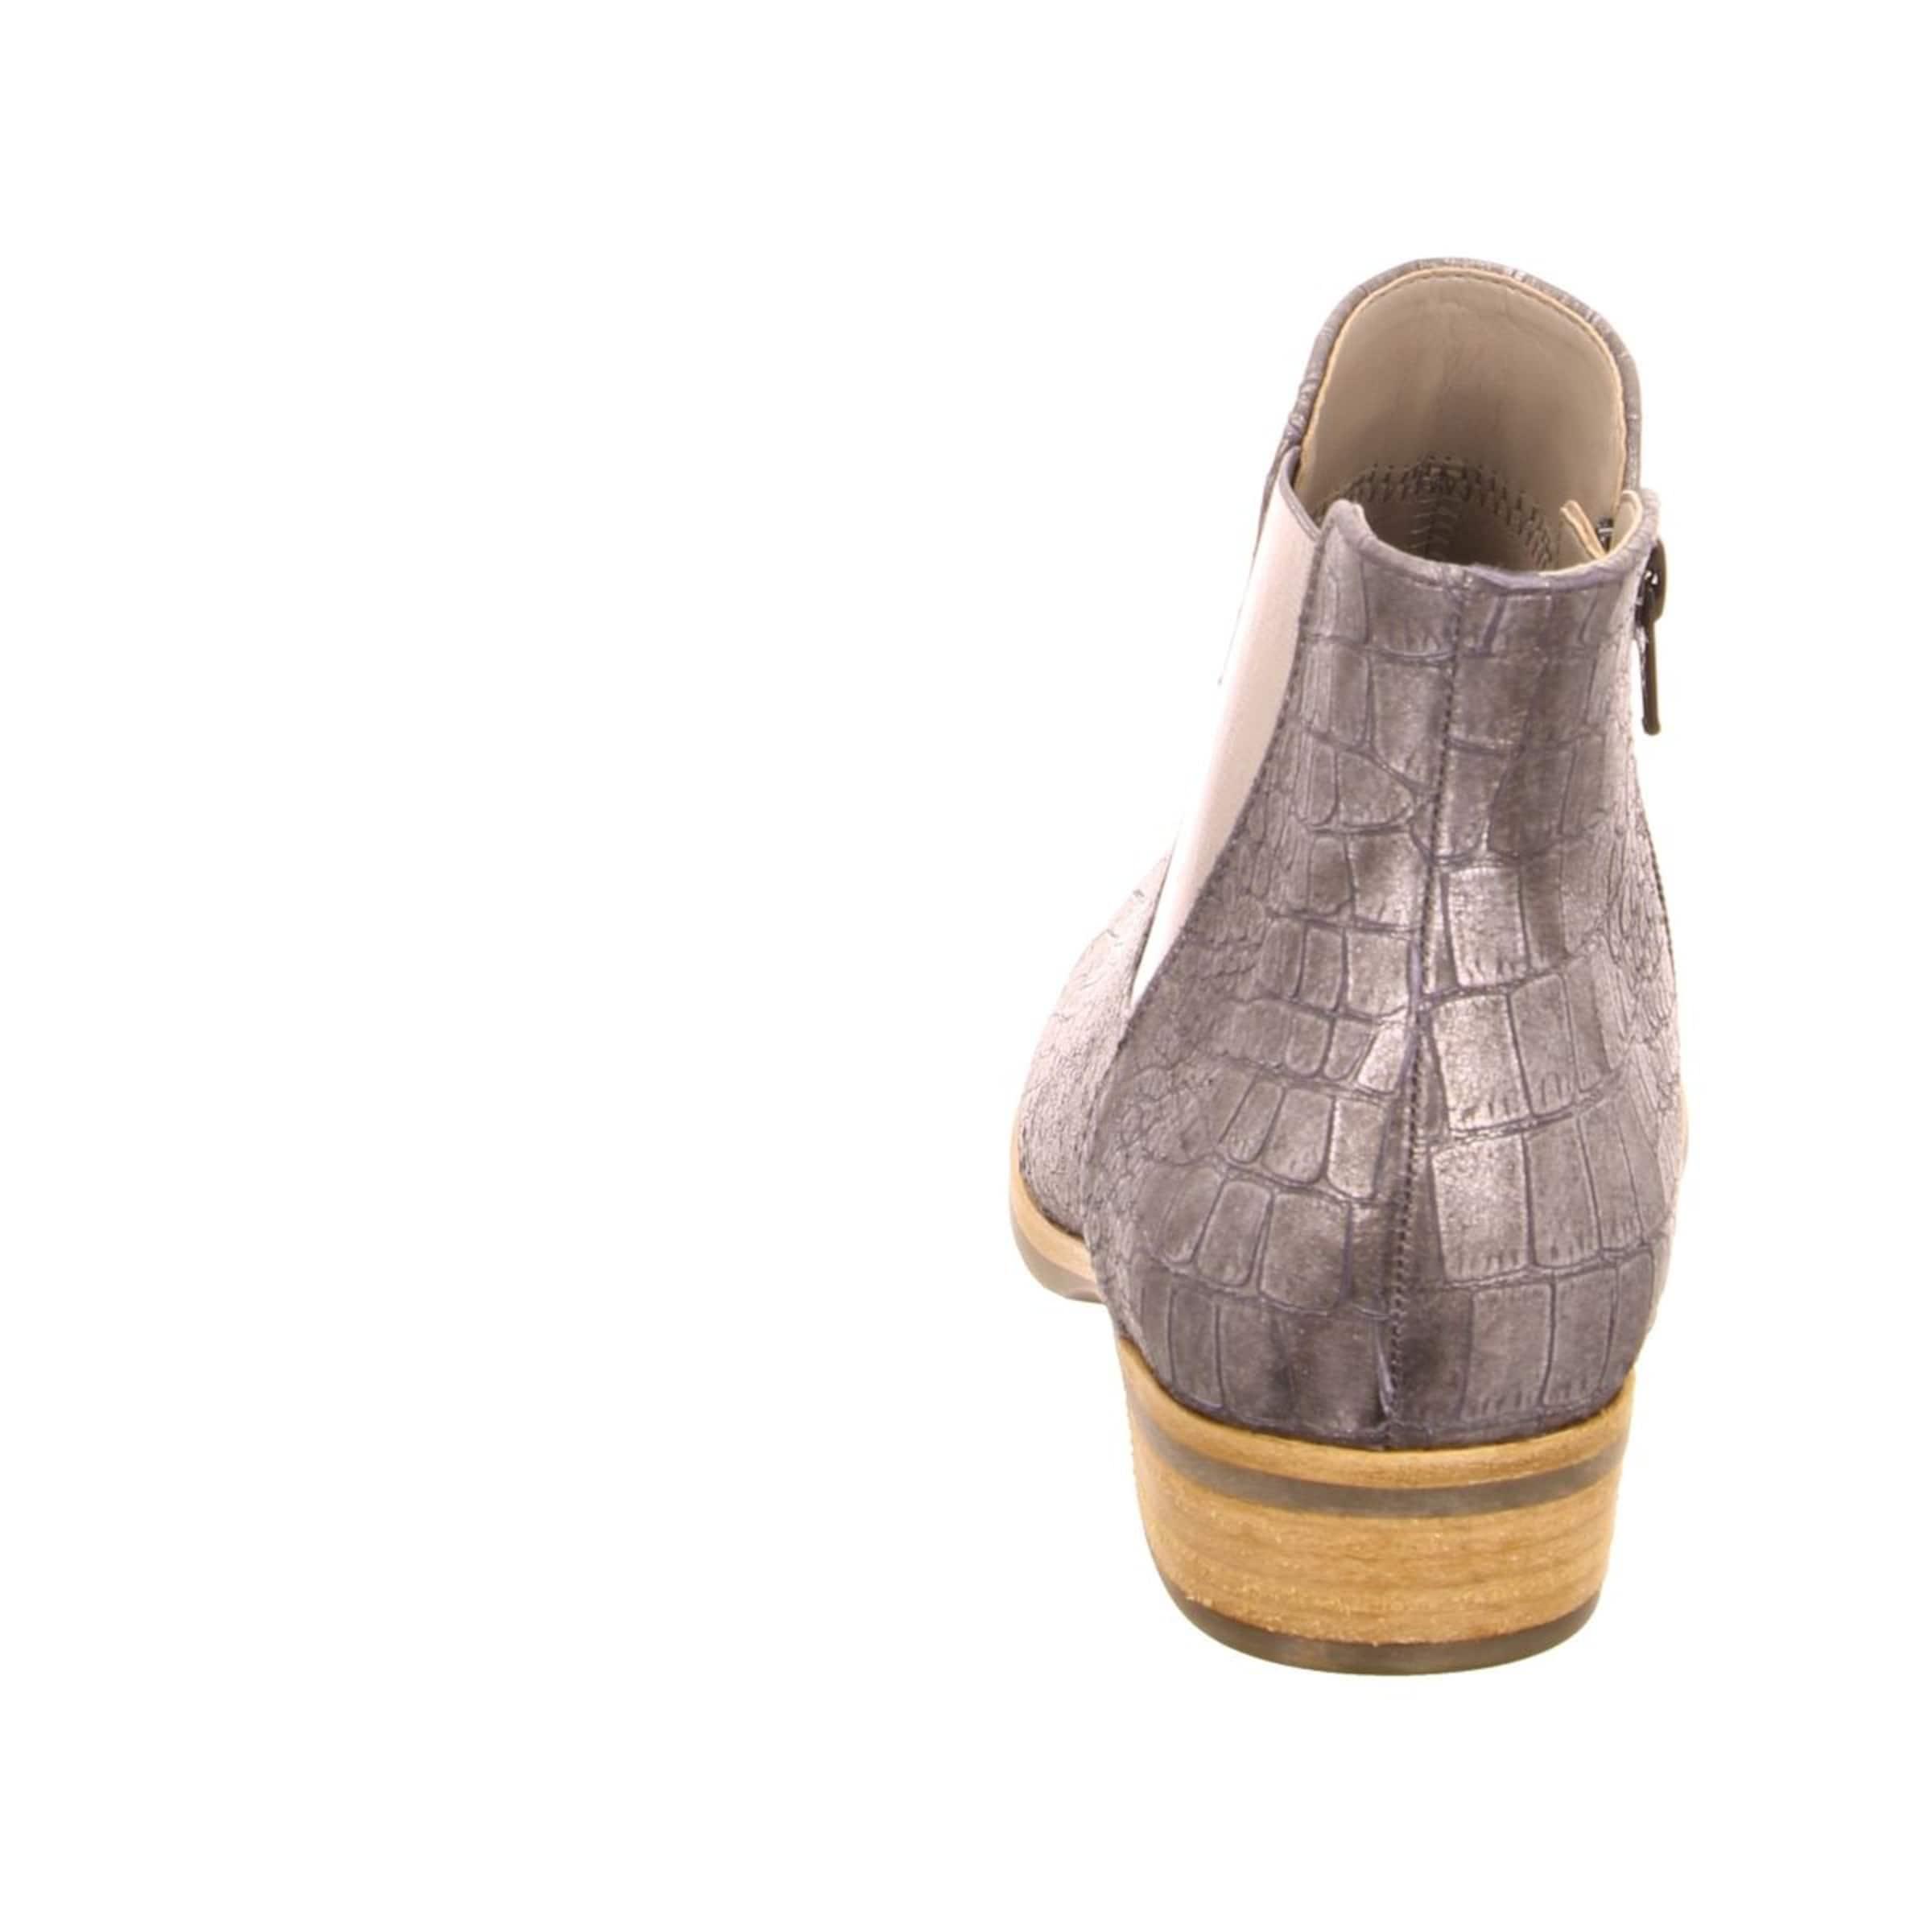 TaupeAltrosa Gabor TaupeAltrosa Gabor In Gabor Stiefel TaupeAltrosa Stiefel Stiefel Stiefel Gabor In In uK1TJ3lFc